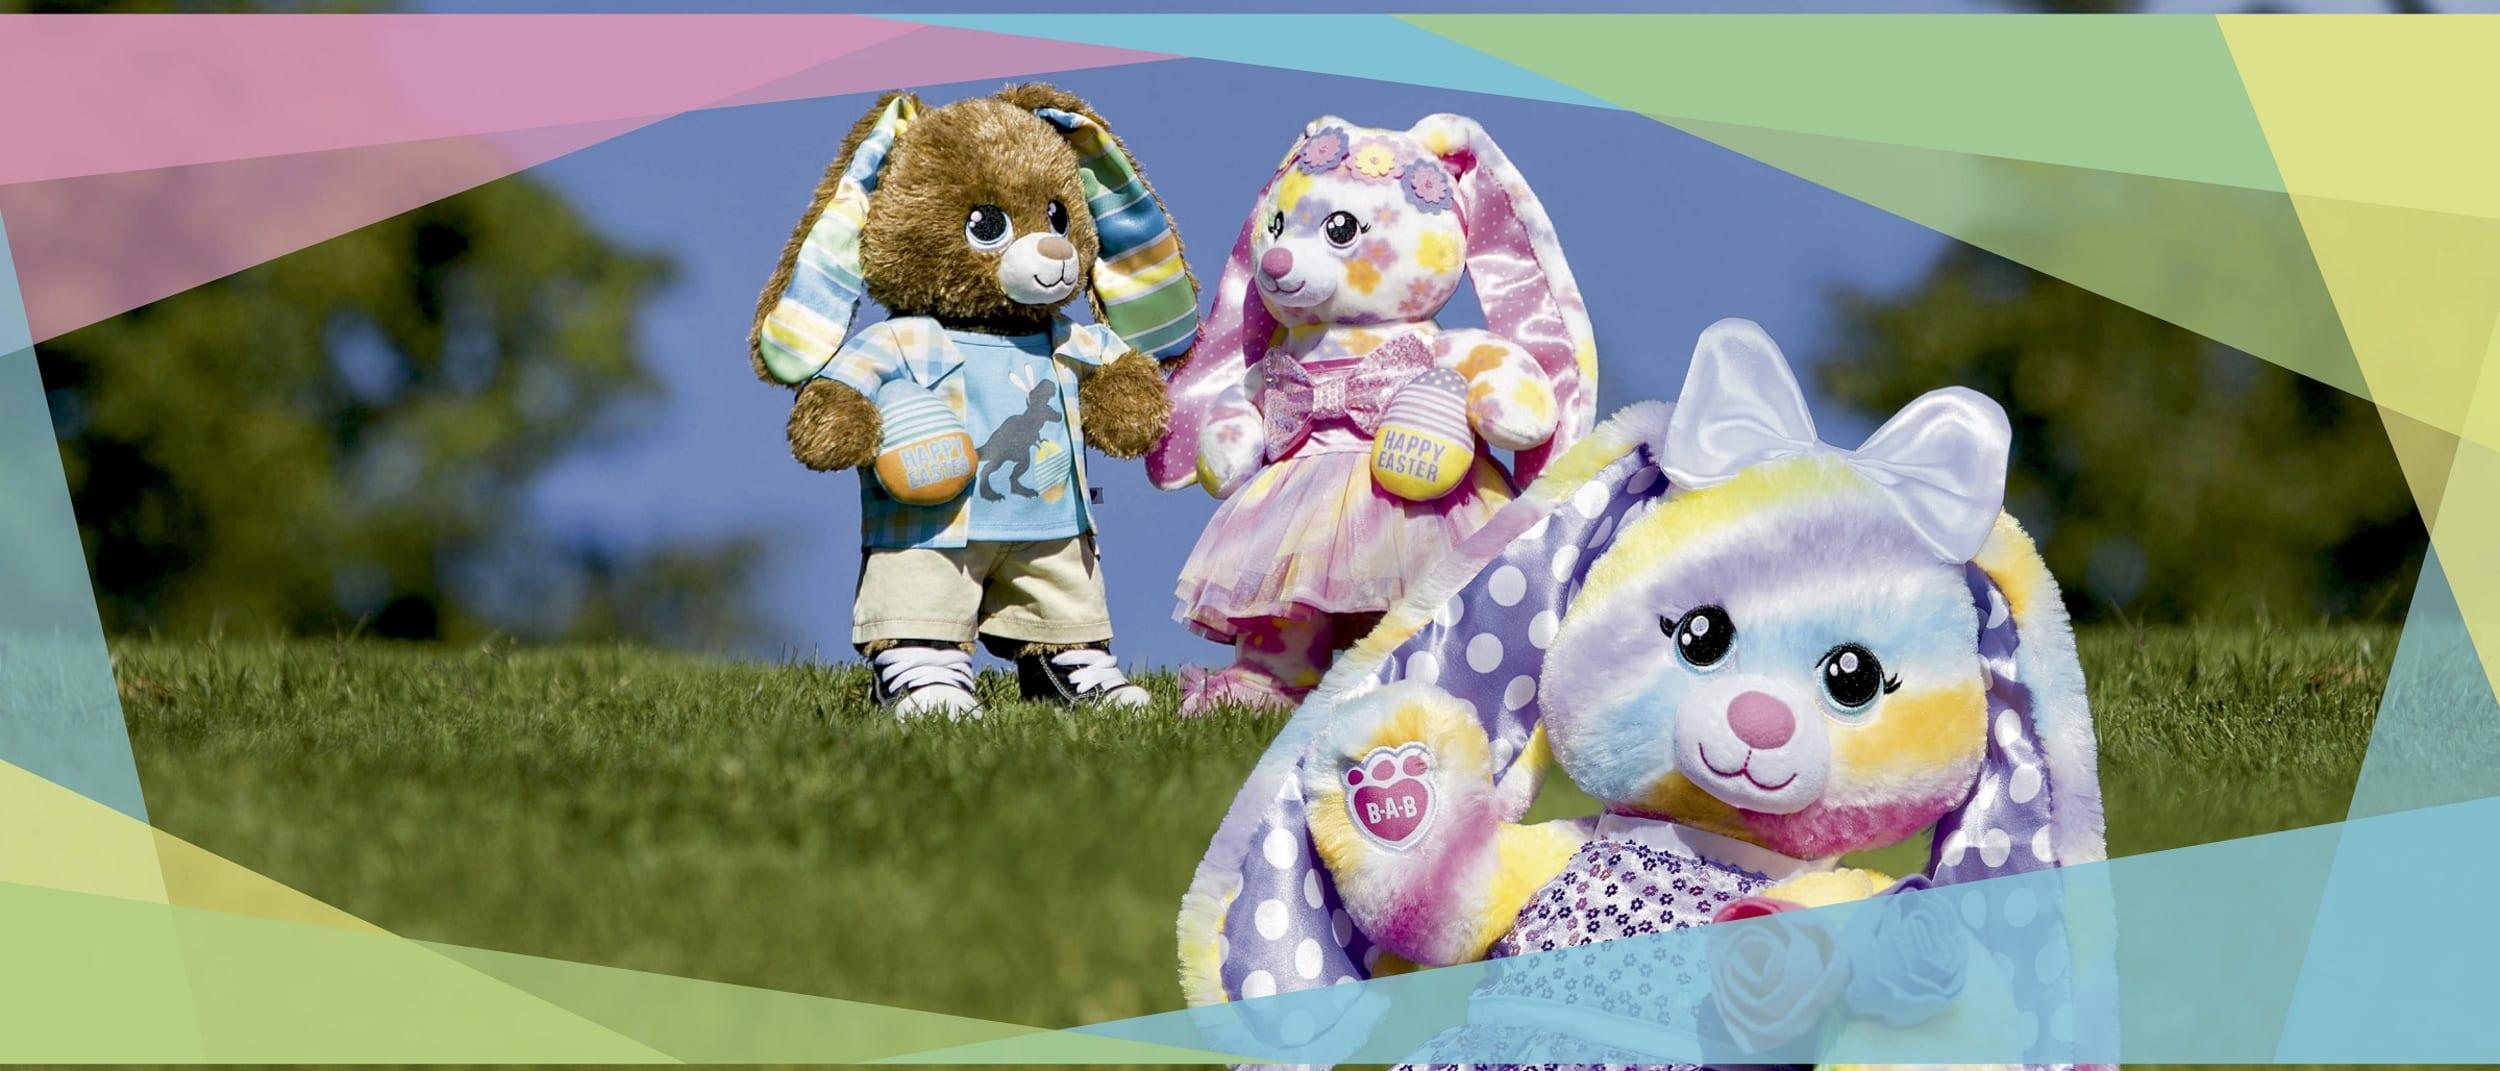 Hoppy Easter from Build-A-Bear Workshop